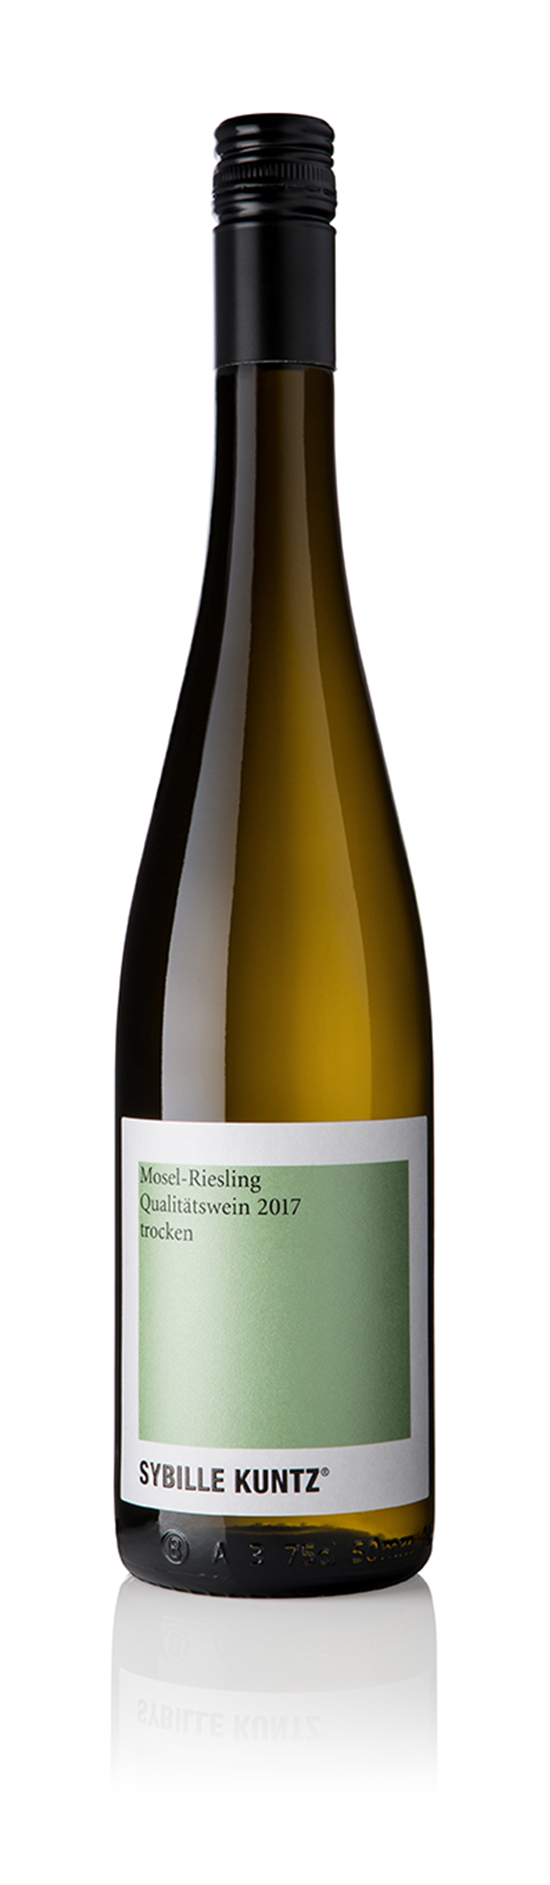 2017 SYBILLE KUNTZ Mosel-Riesling Qualitätswein trocken 0,75 l